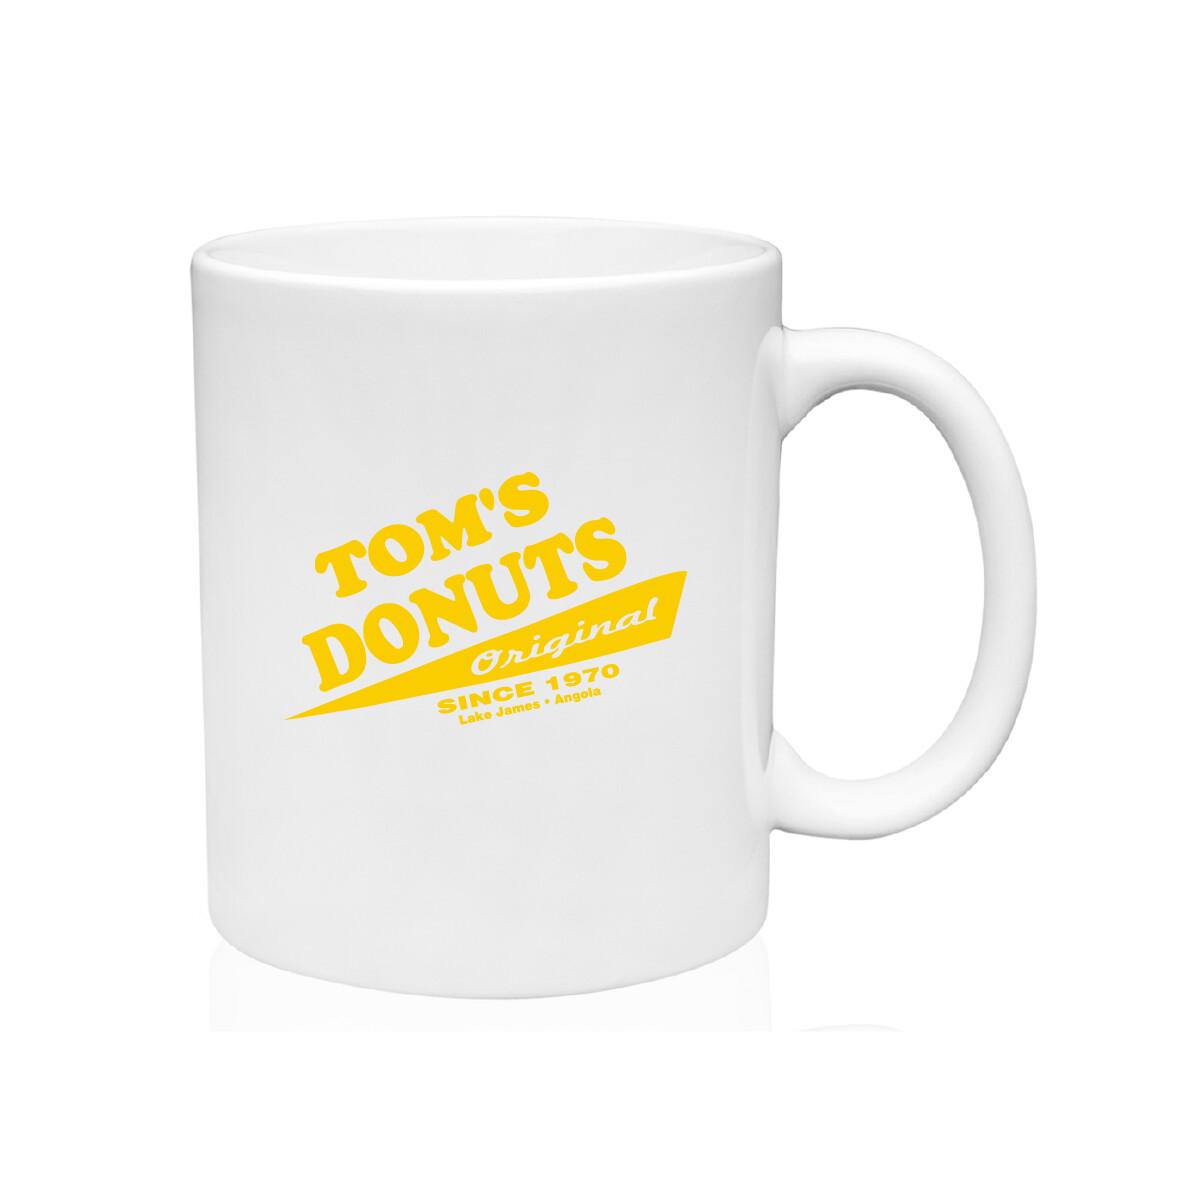 Tom's Donuts Mug - Yellow Logo